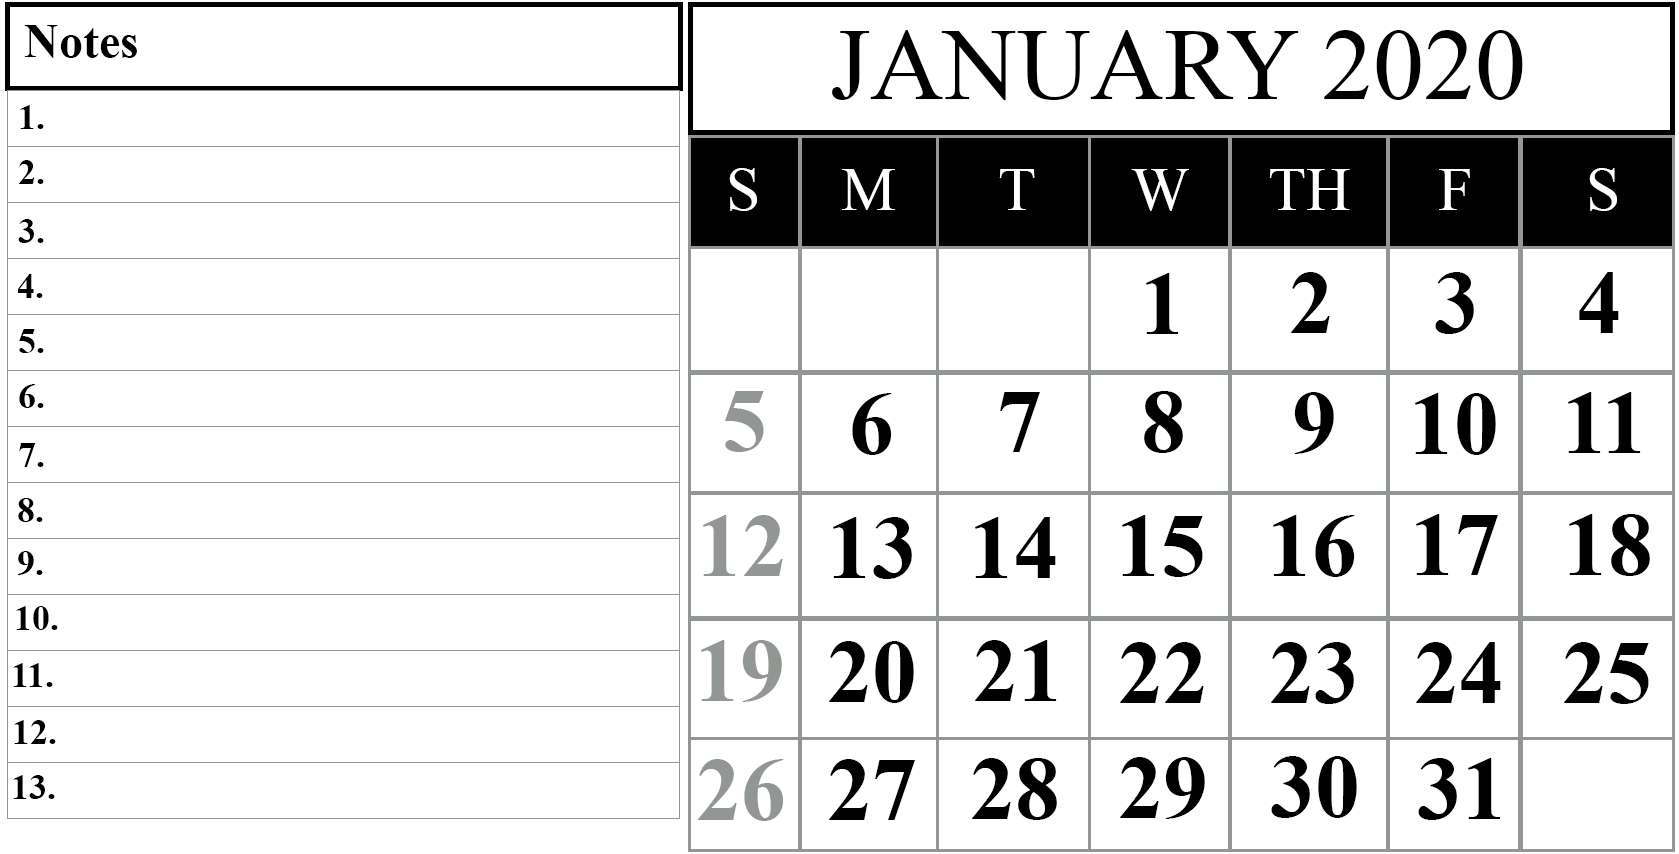 January 2020 Calendar Notes